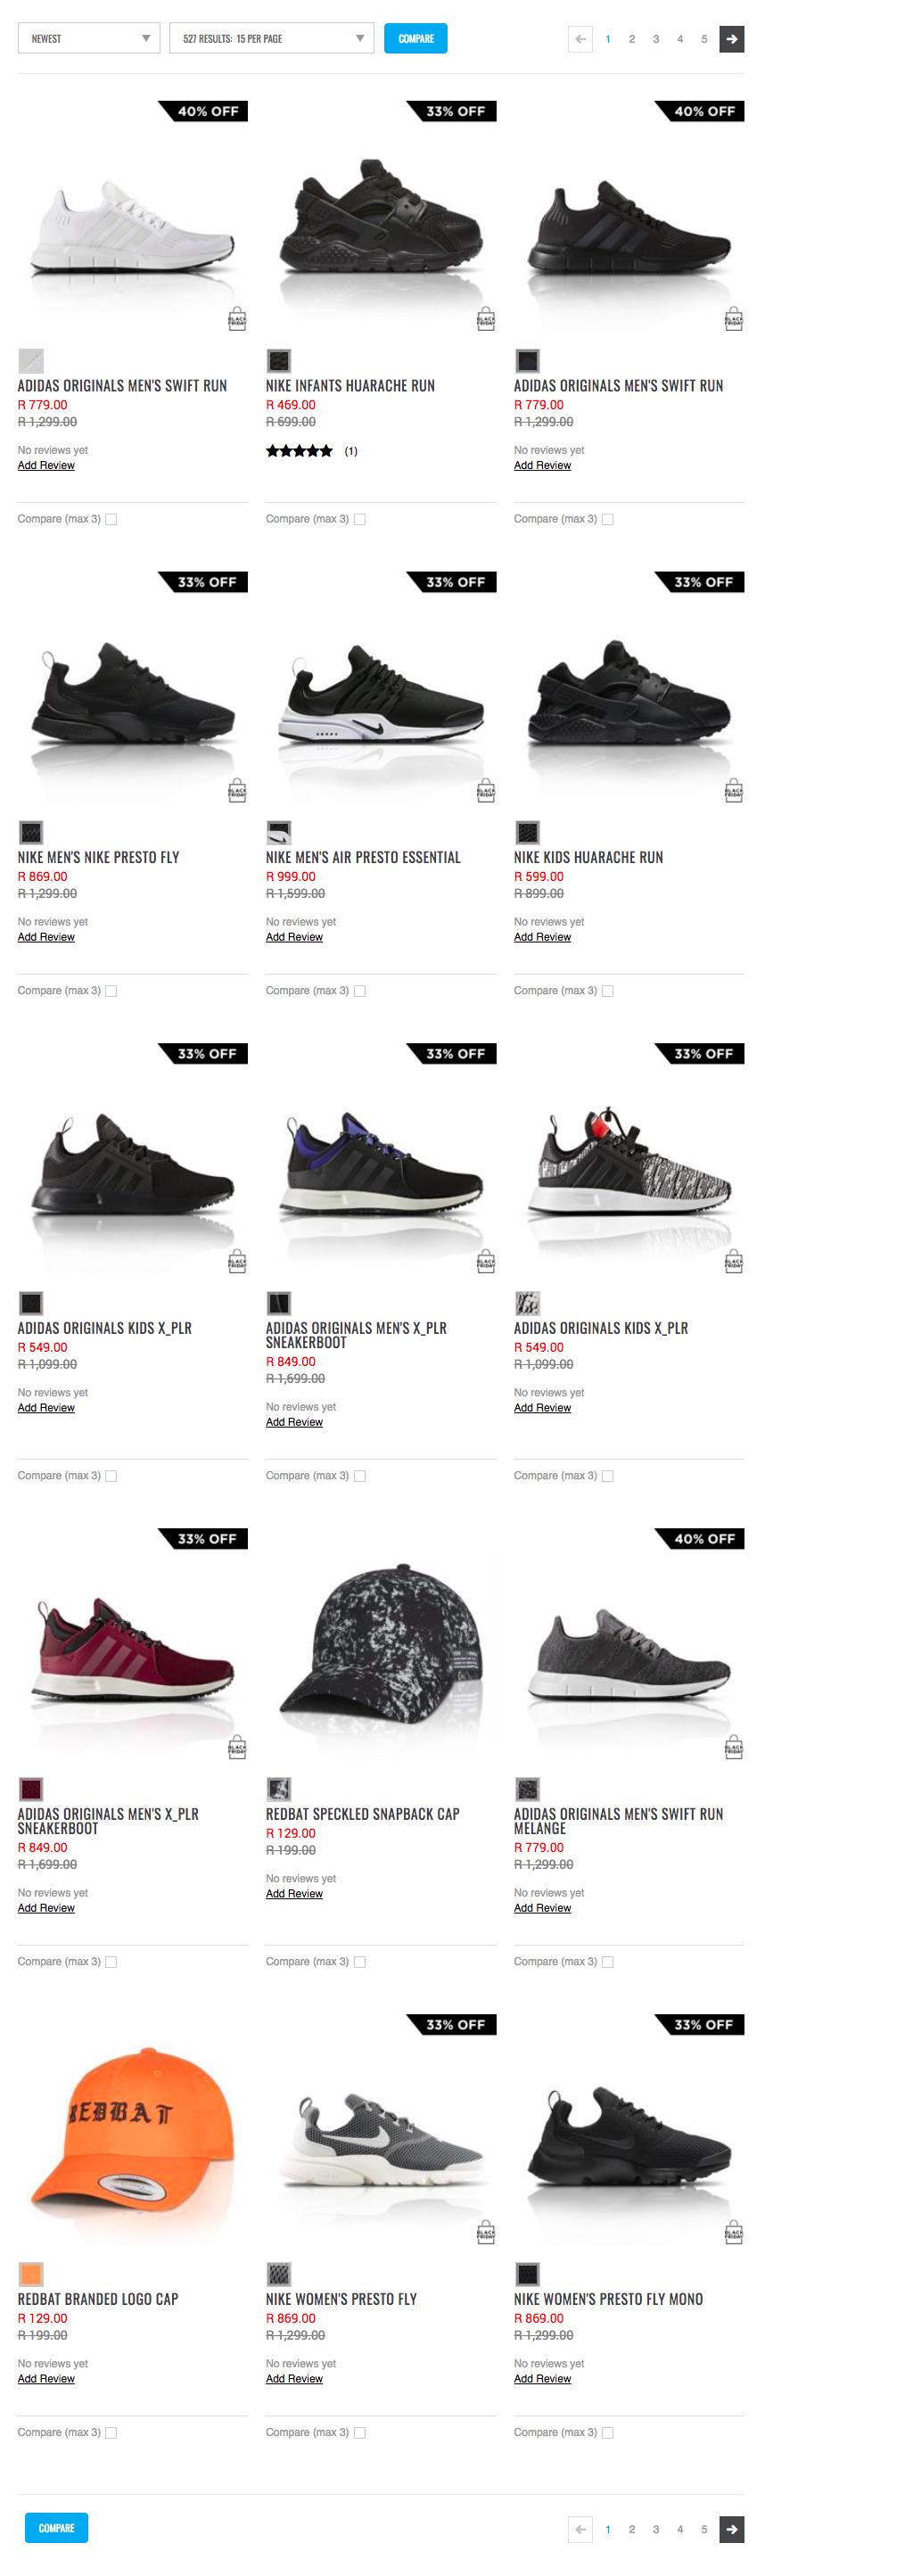 adidas superstar price at sportscene